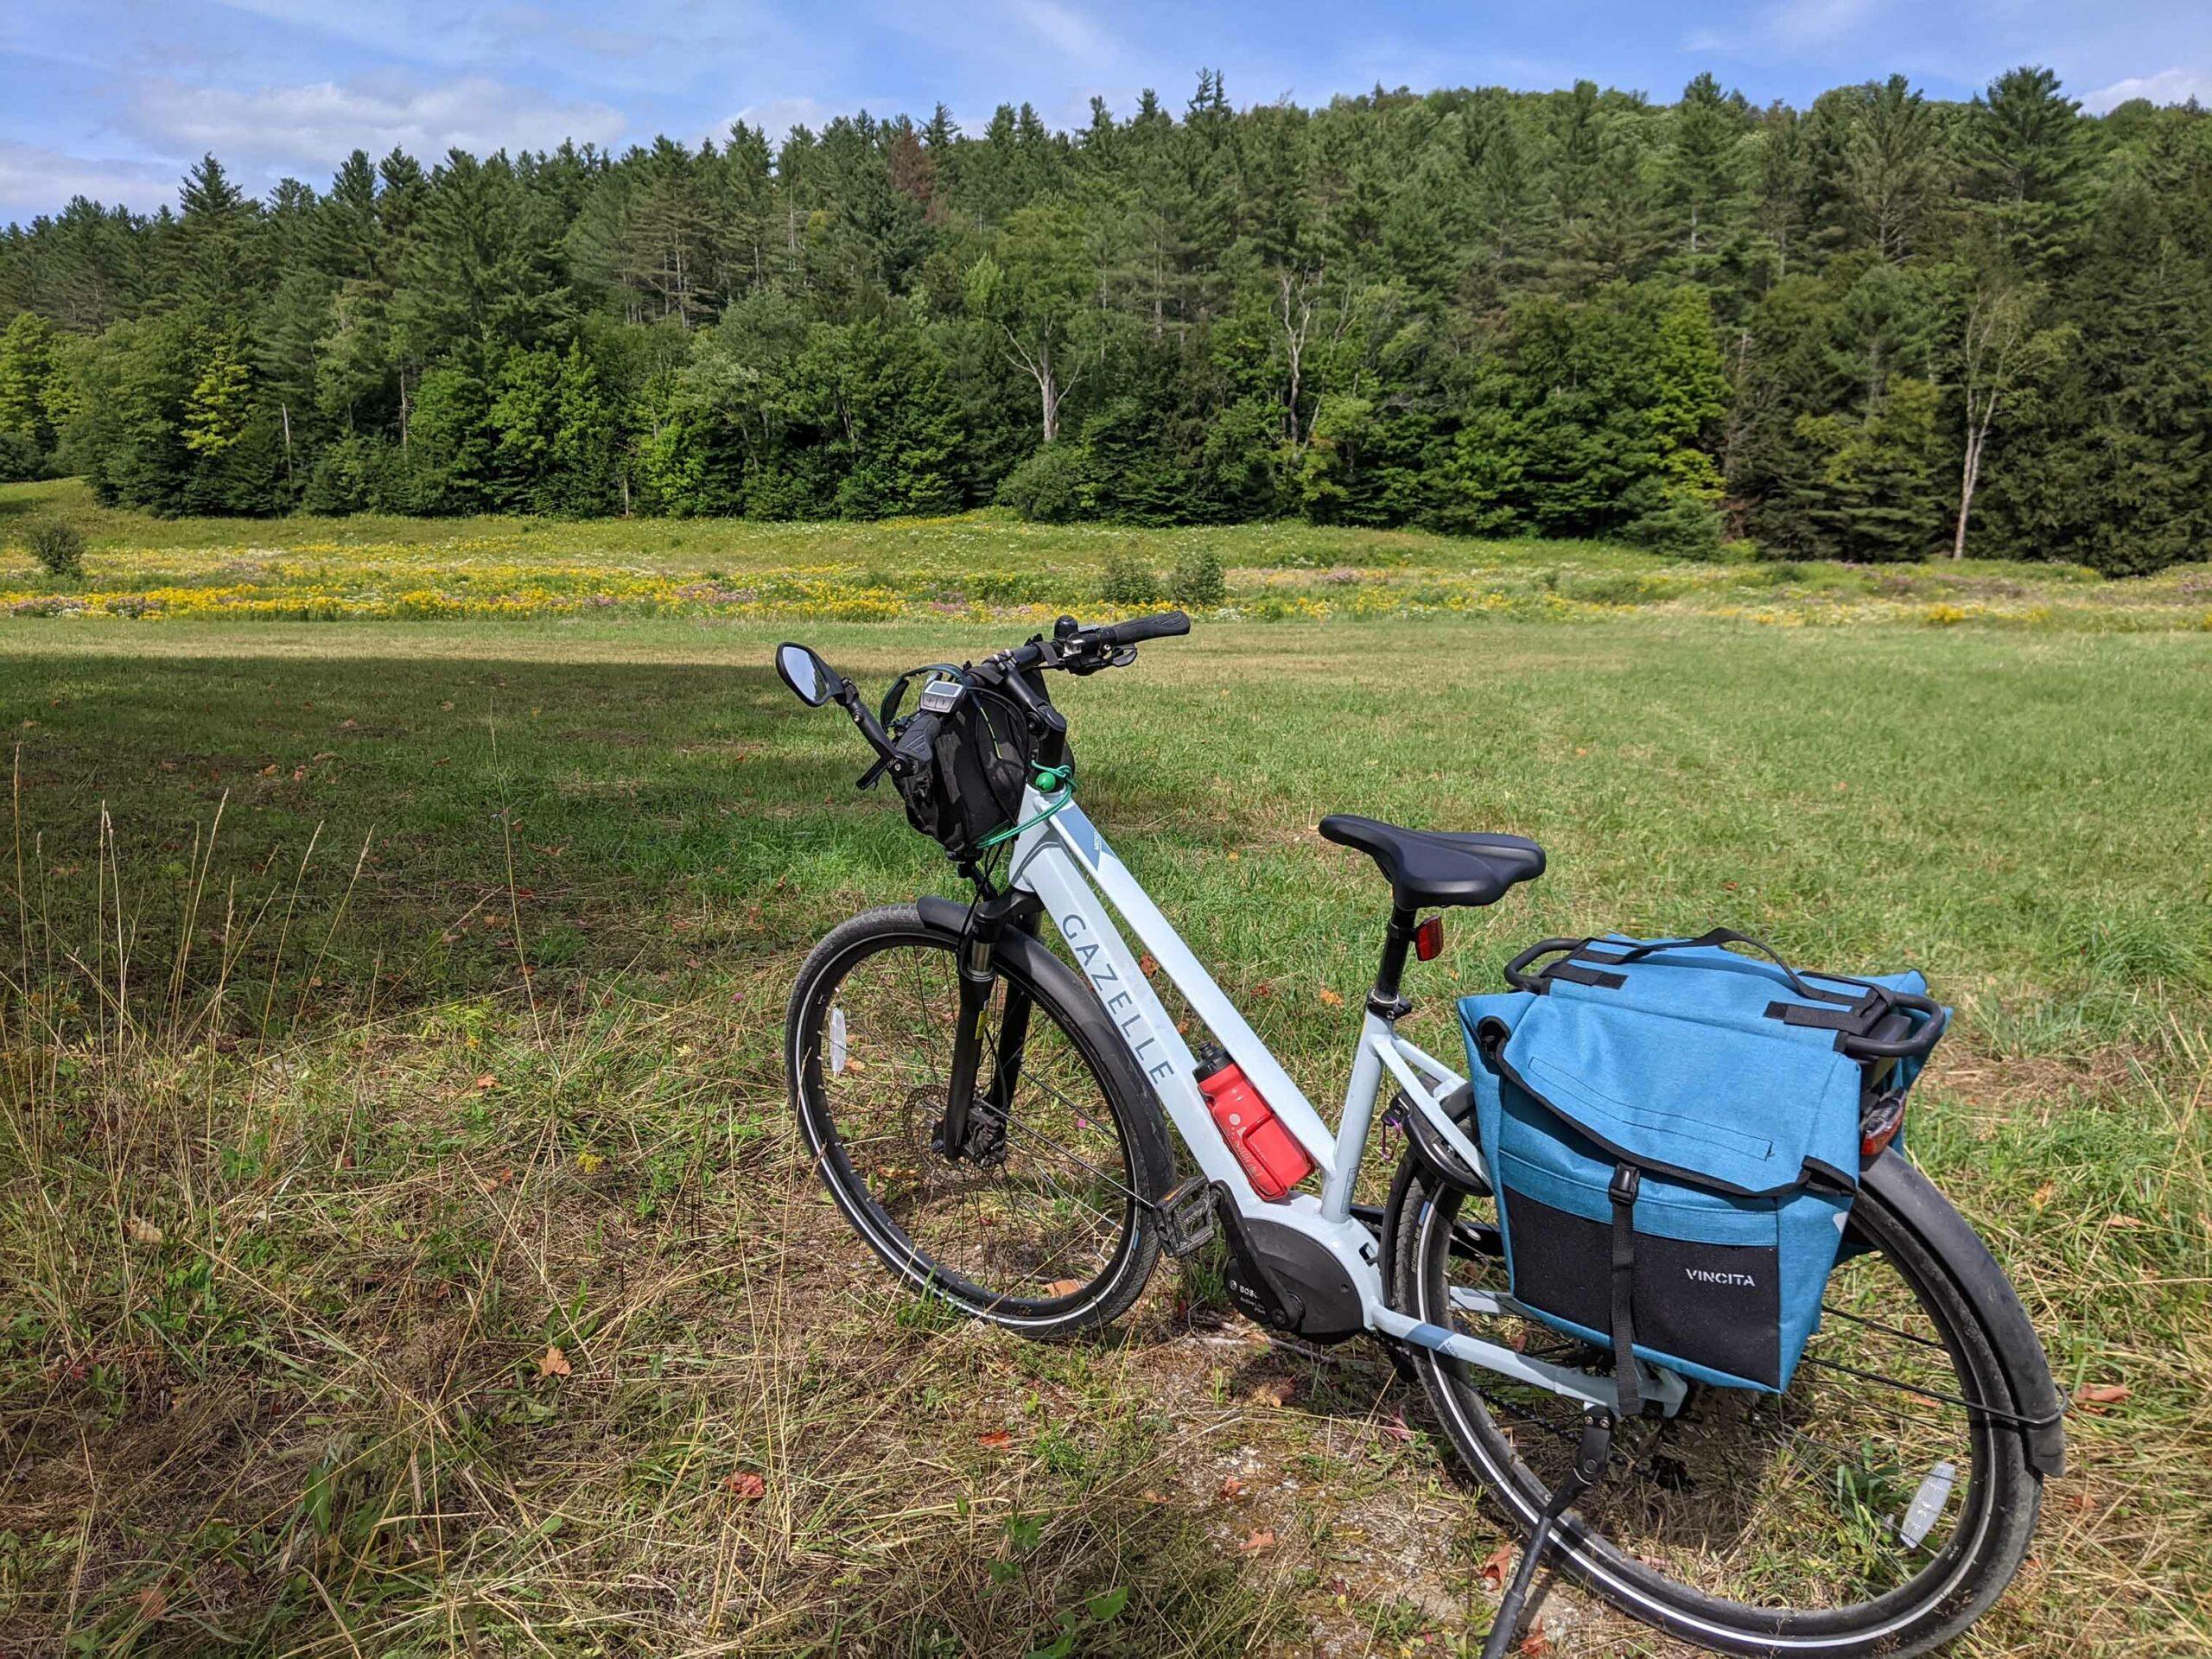 Gazelle Medeo T9 Ebike Rider Story